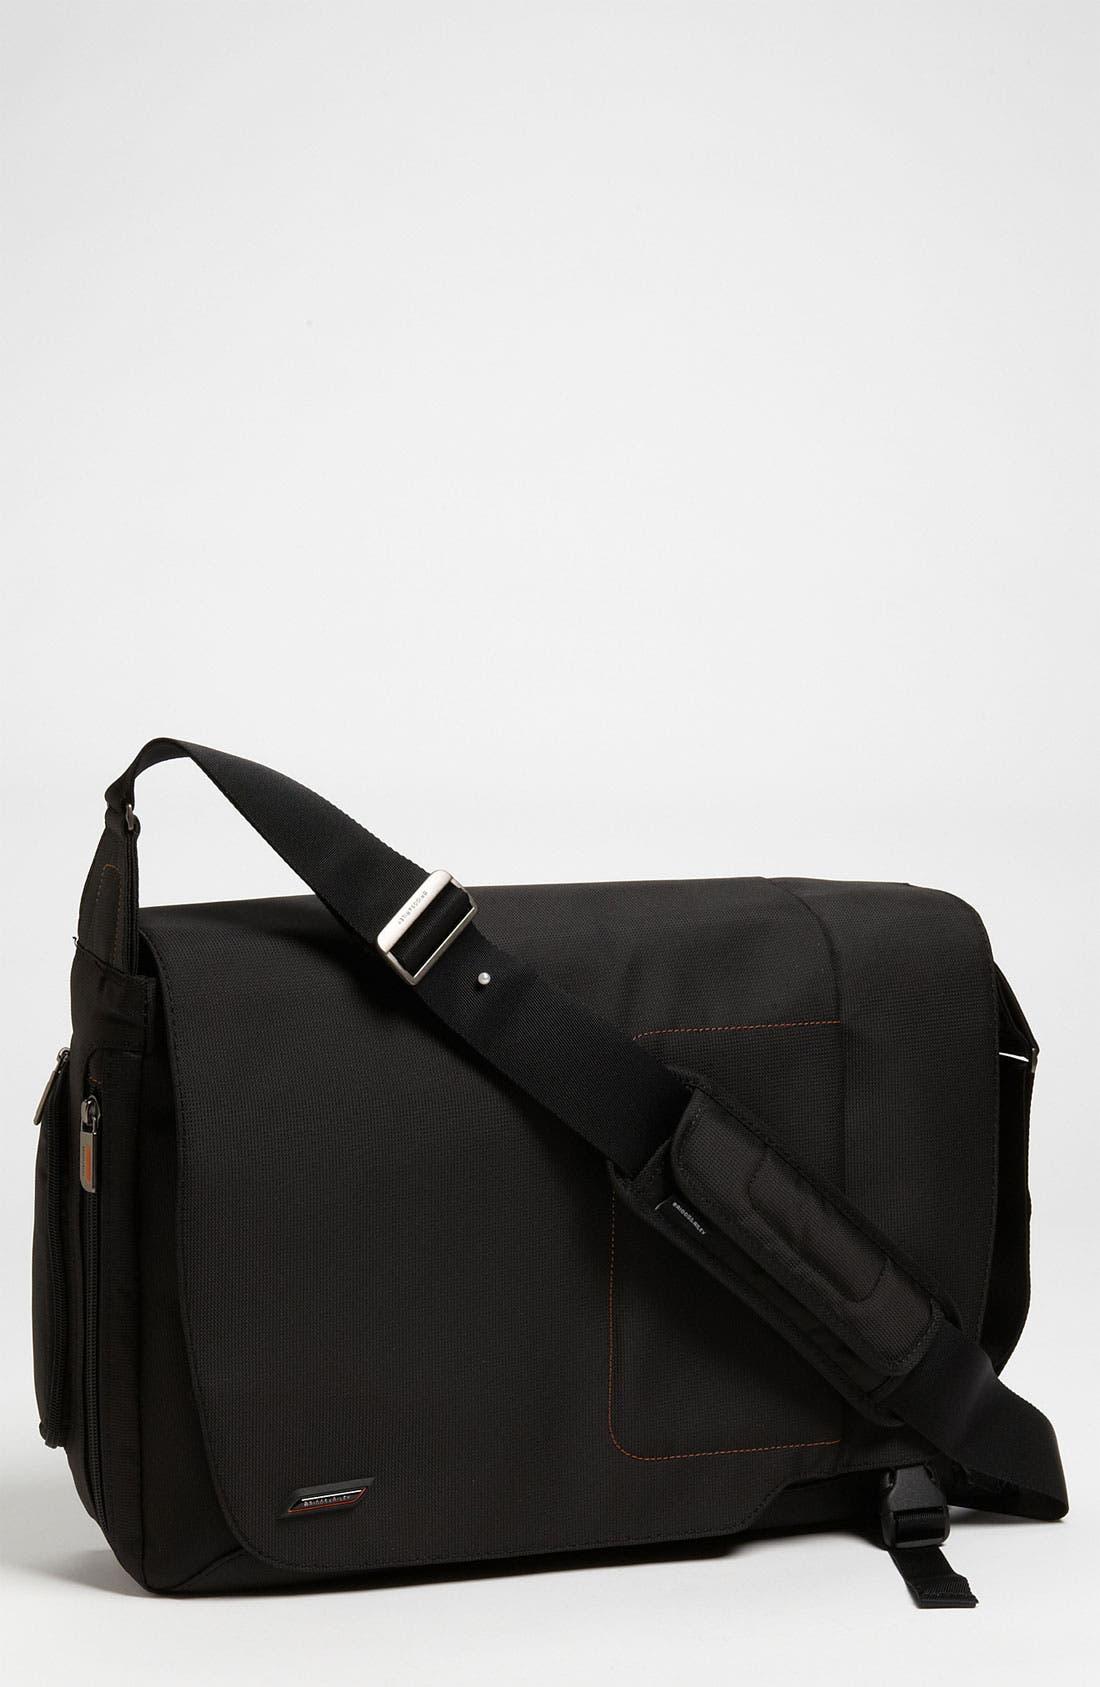 Main Image - Briggs & Riley 'Verb - Grow' Expandable Water Resistant Messenger Bag